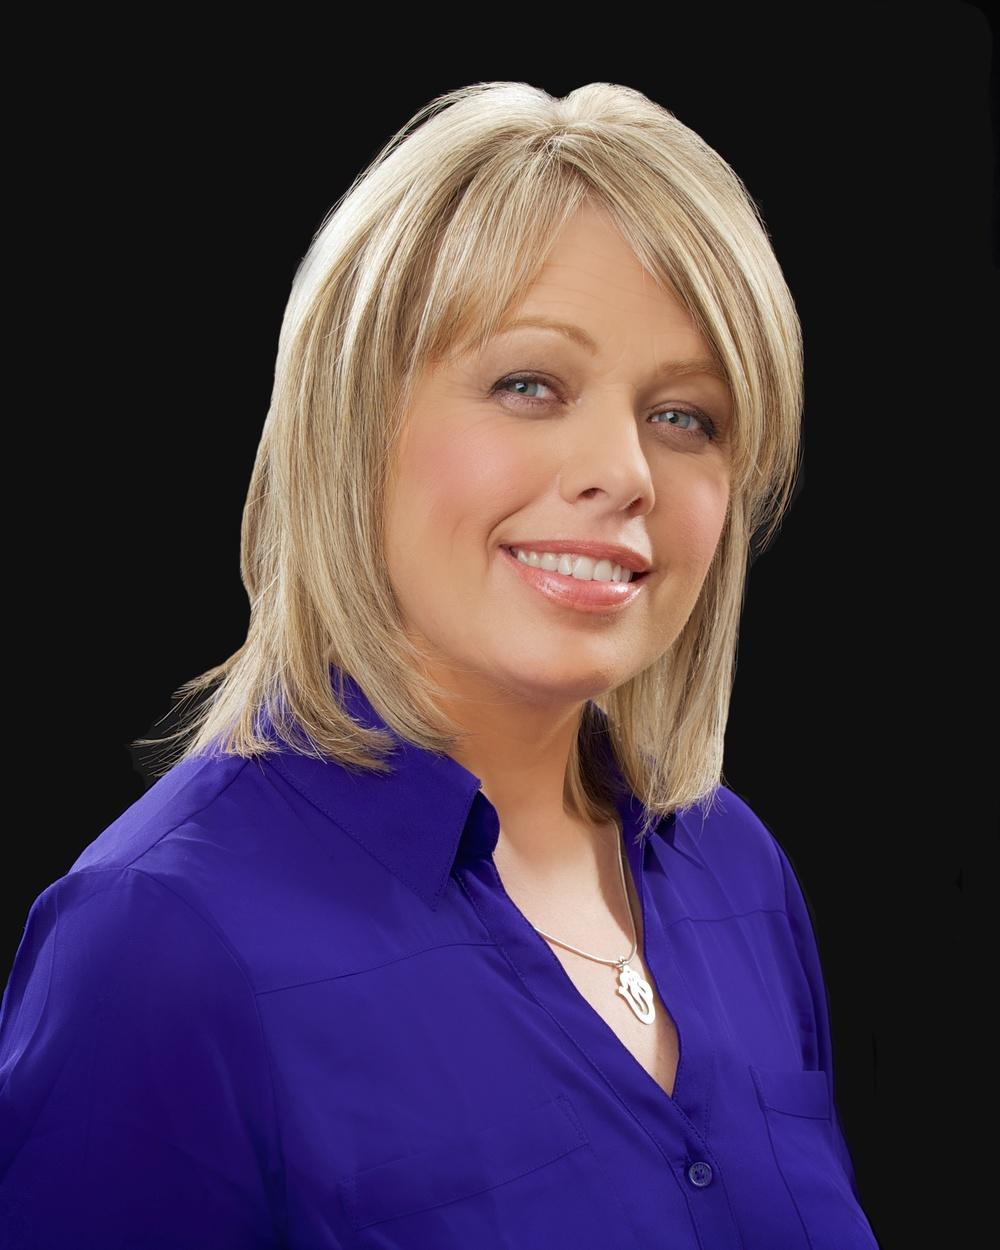 Beth O'Connor